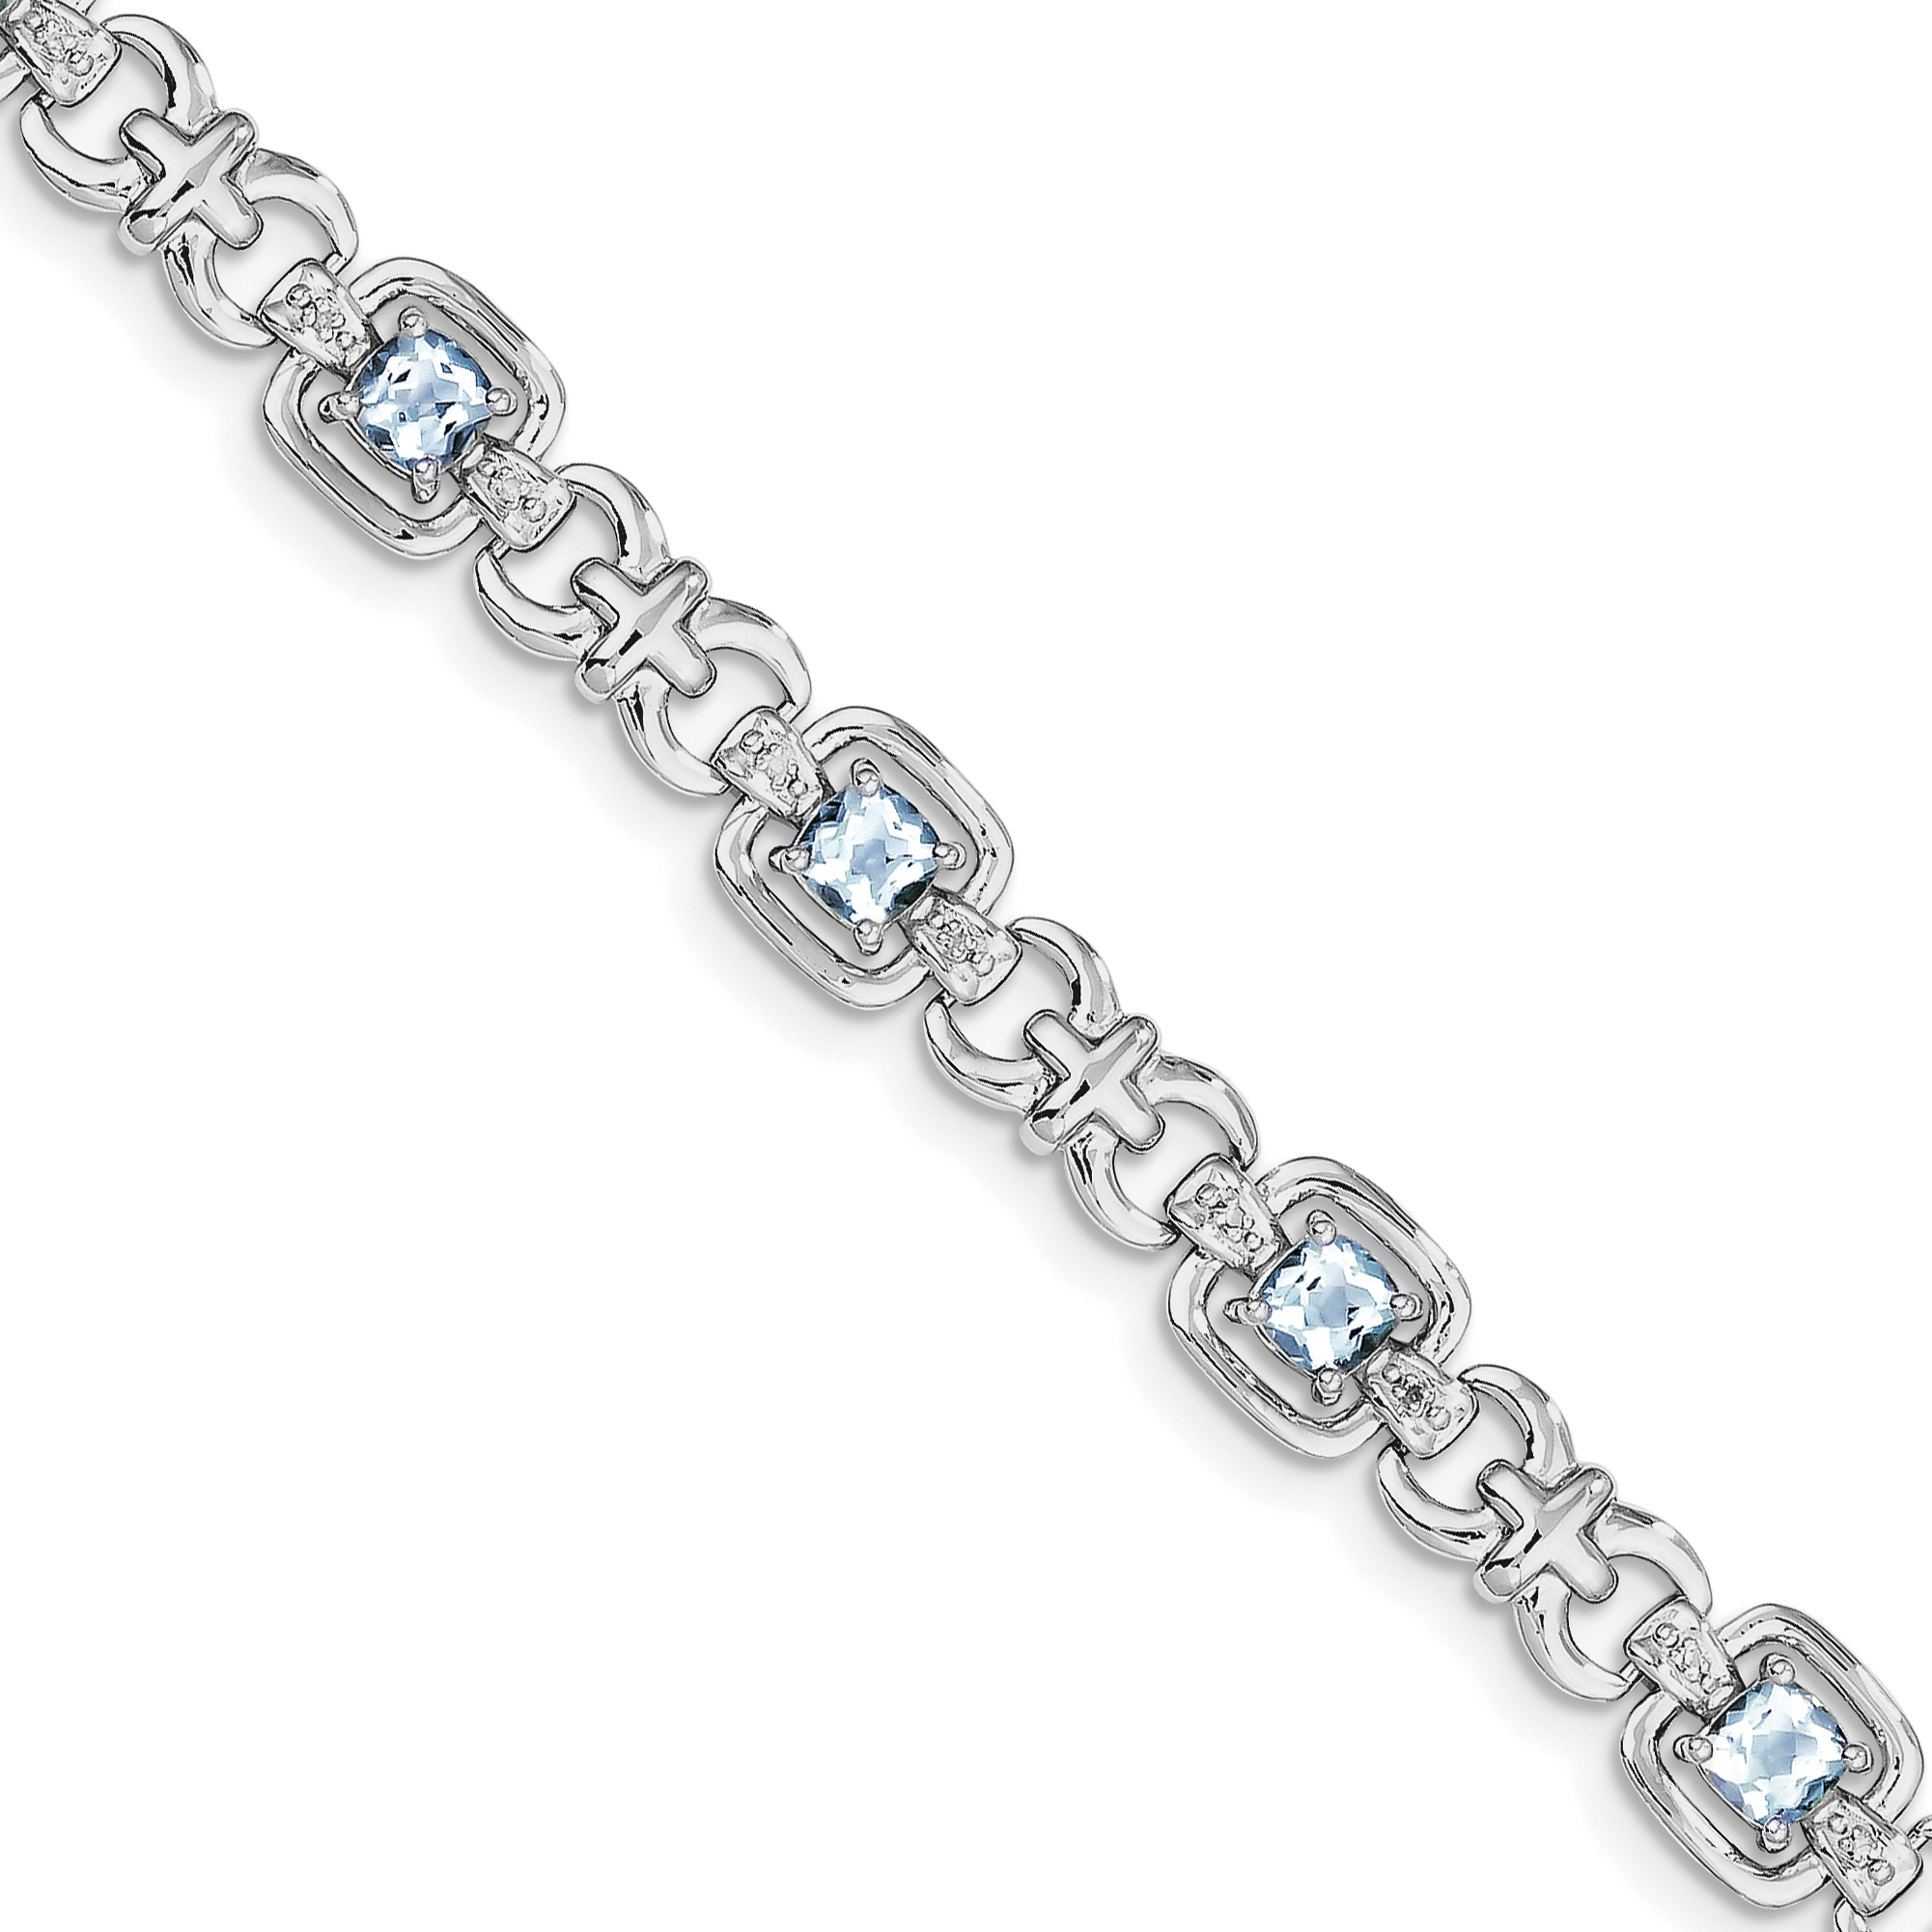 Sterling Silver Diamond & Light Swiss Blue Topaz Bracelet by Kevin Jewelers